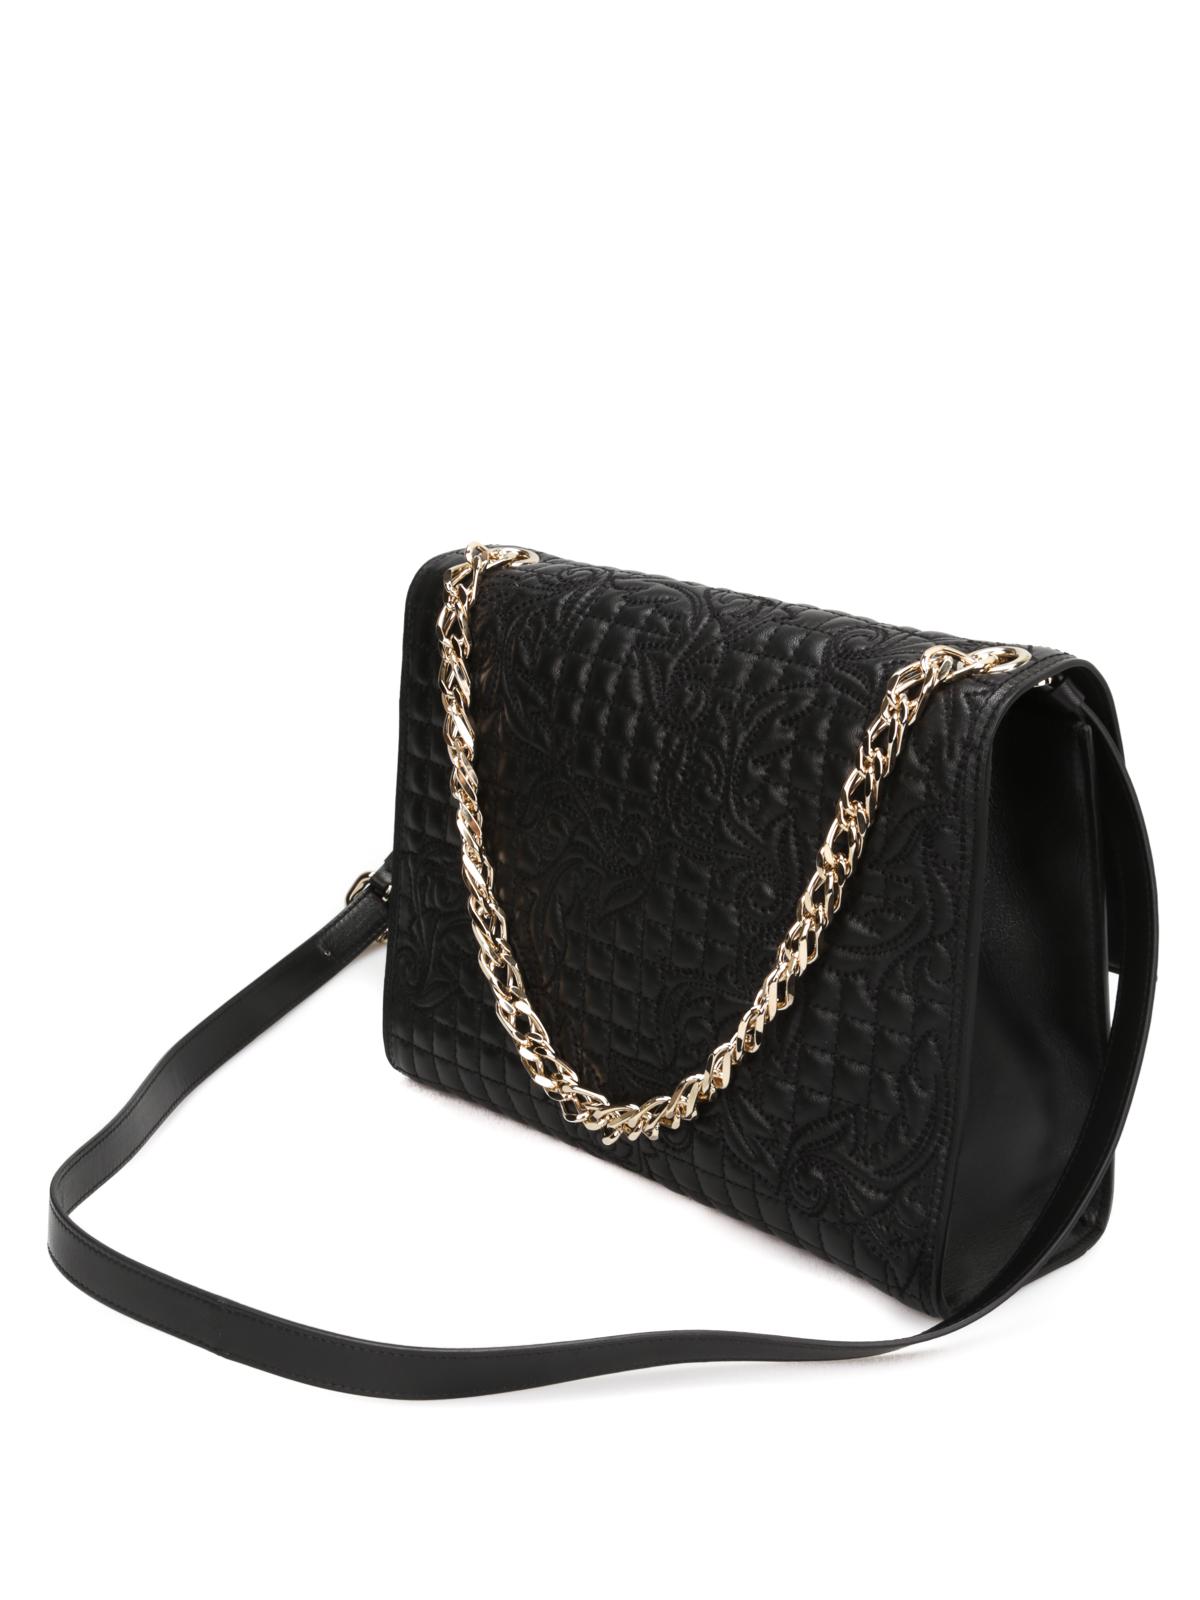 8ab3a7aaf258 Versace - Vanitas Barocco bag - shoulder bags - DBFF054 DNRVN D410C